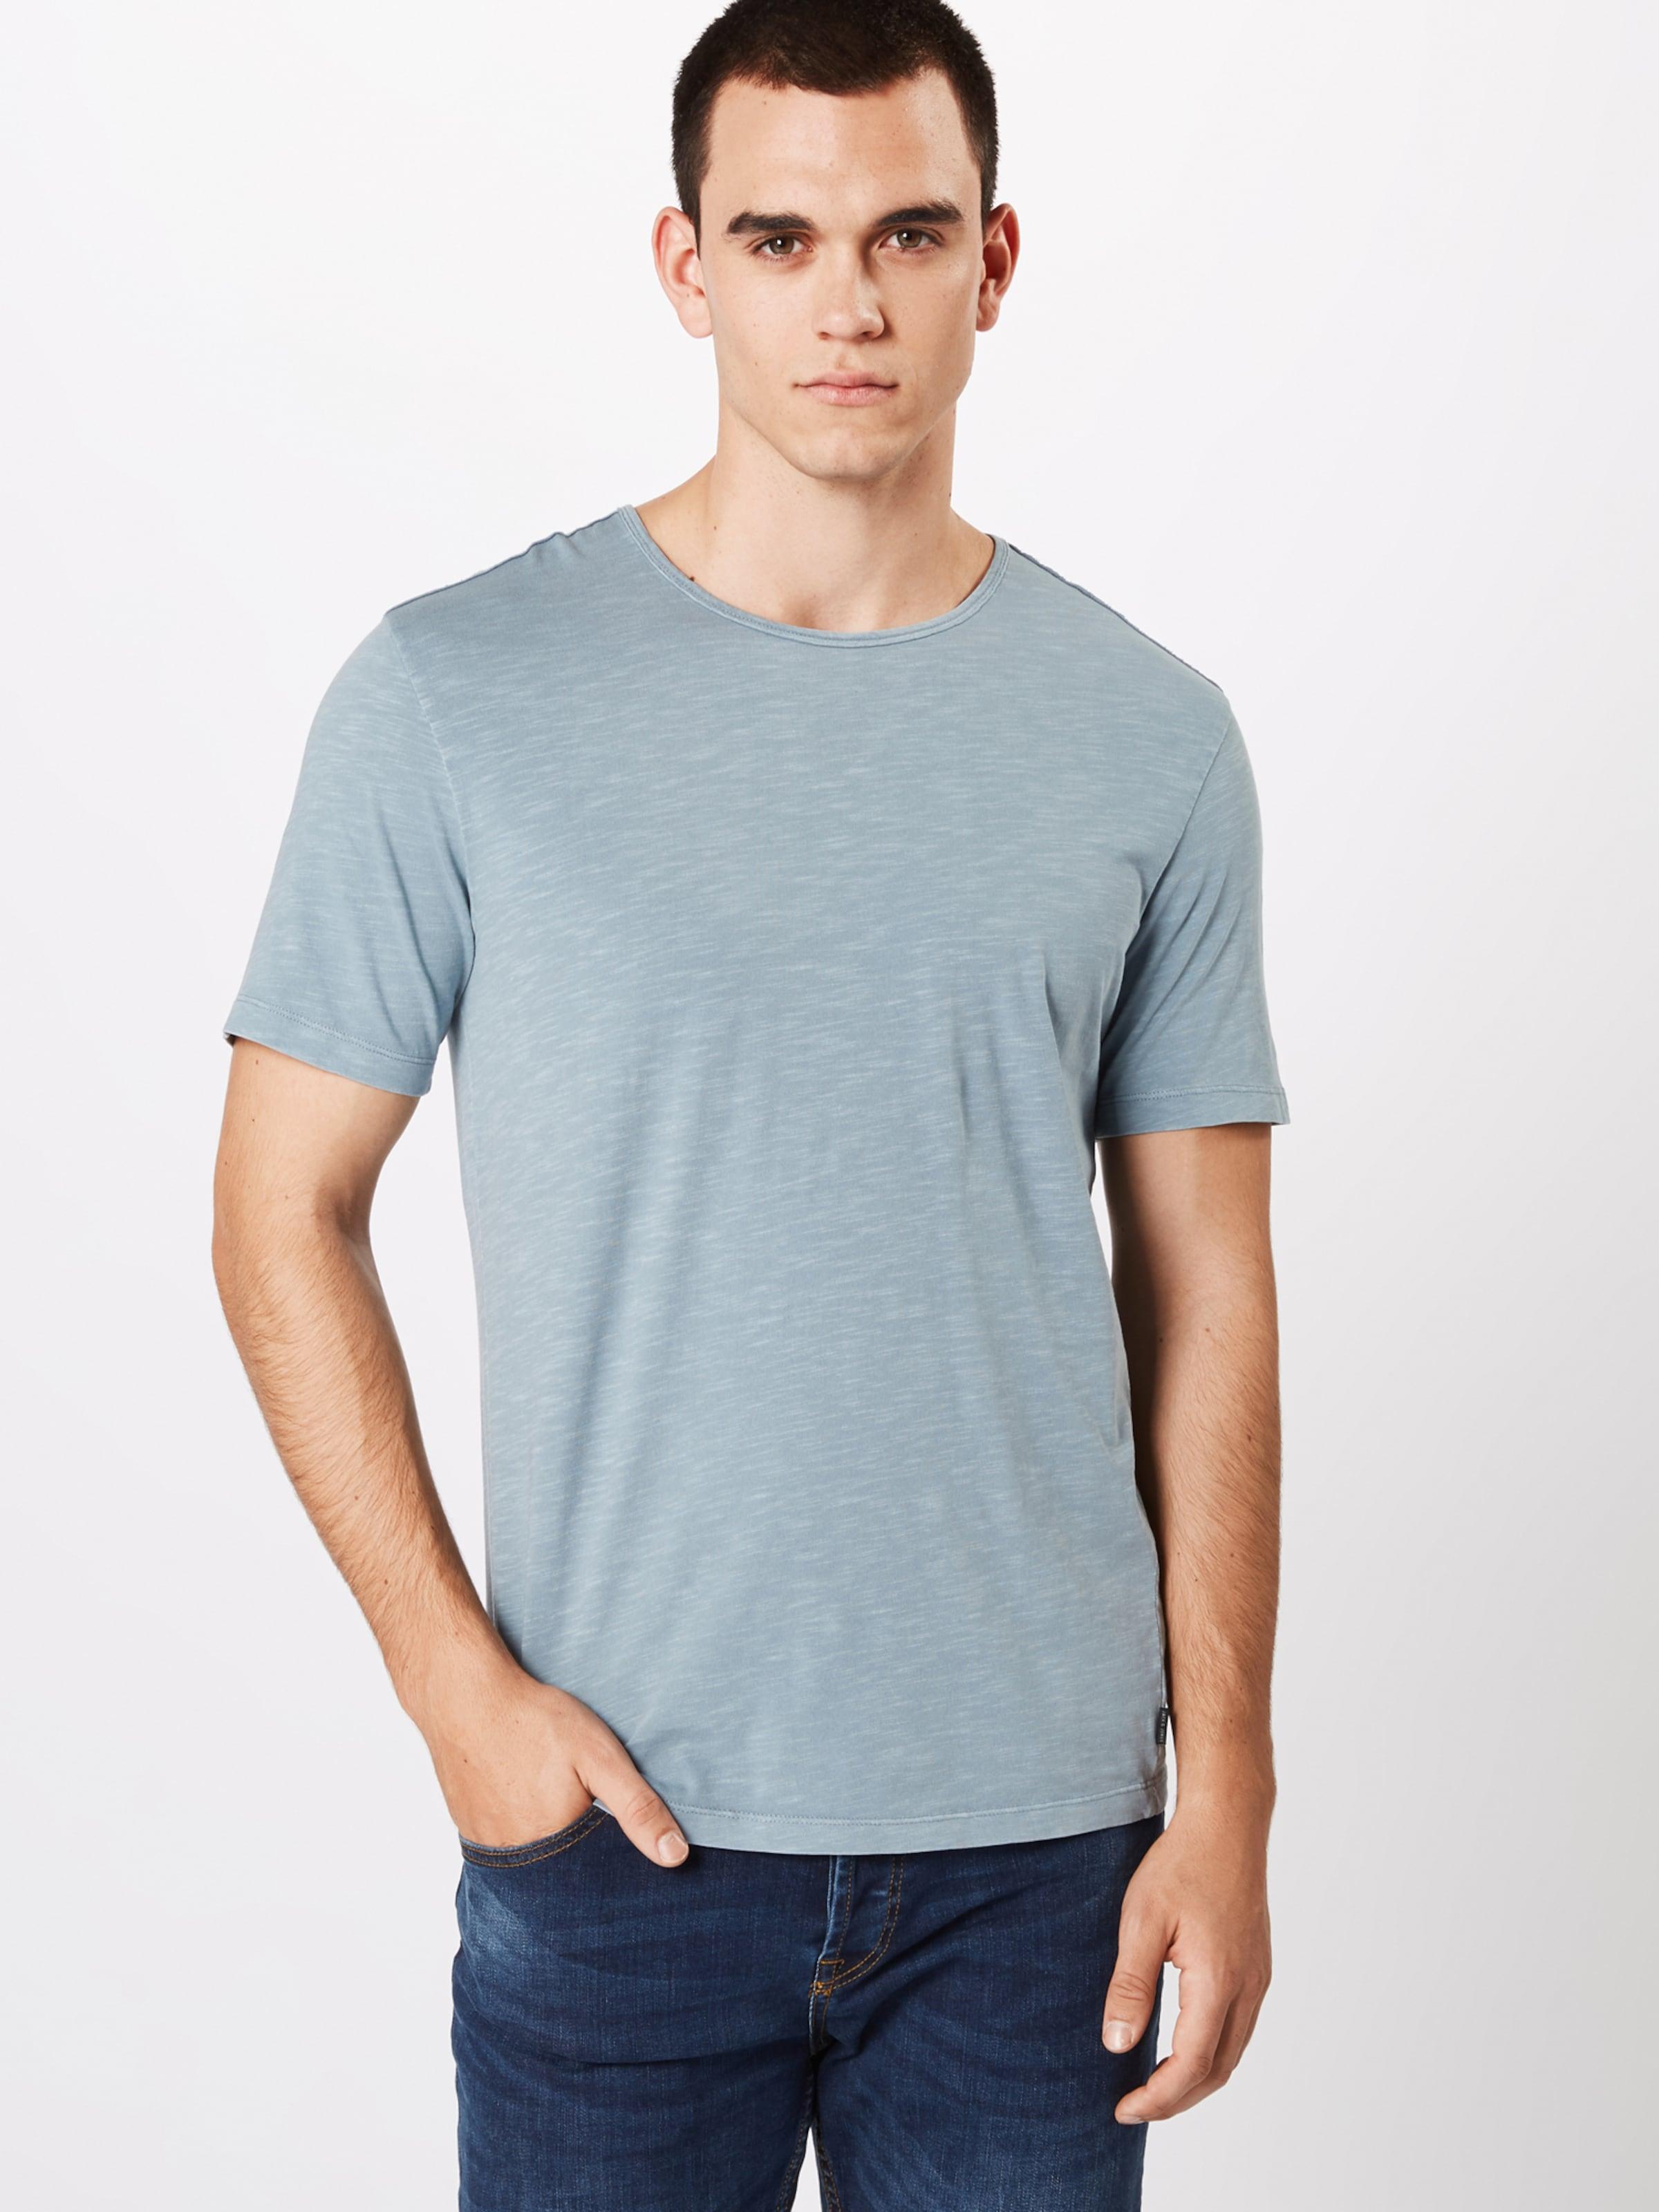 Shirt Taubenblau Jackamp; In Jones Jackamp; Jones In Shirt Yb67fygv